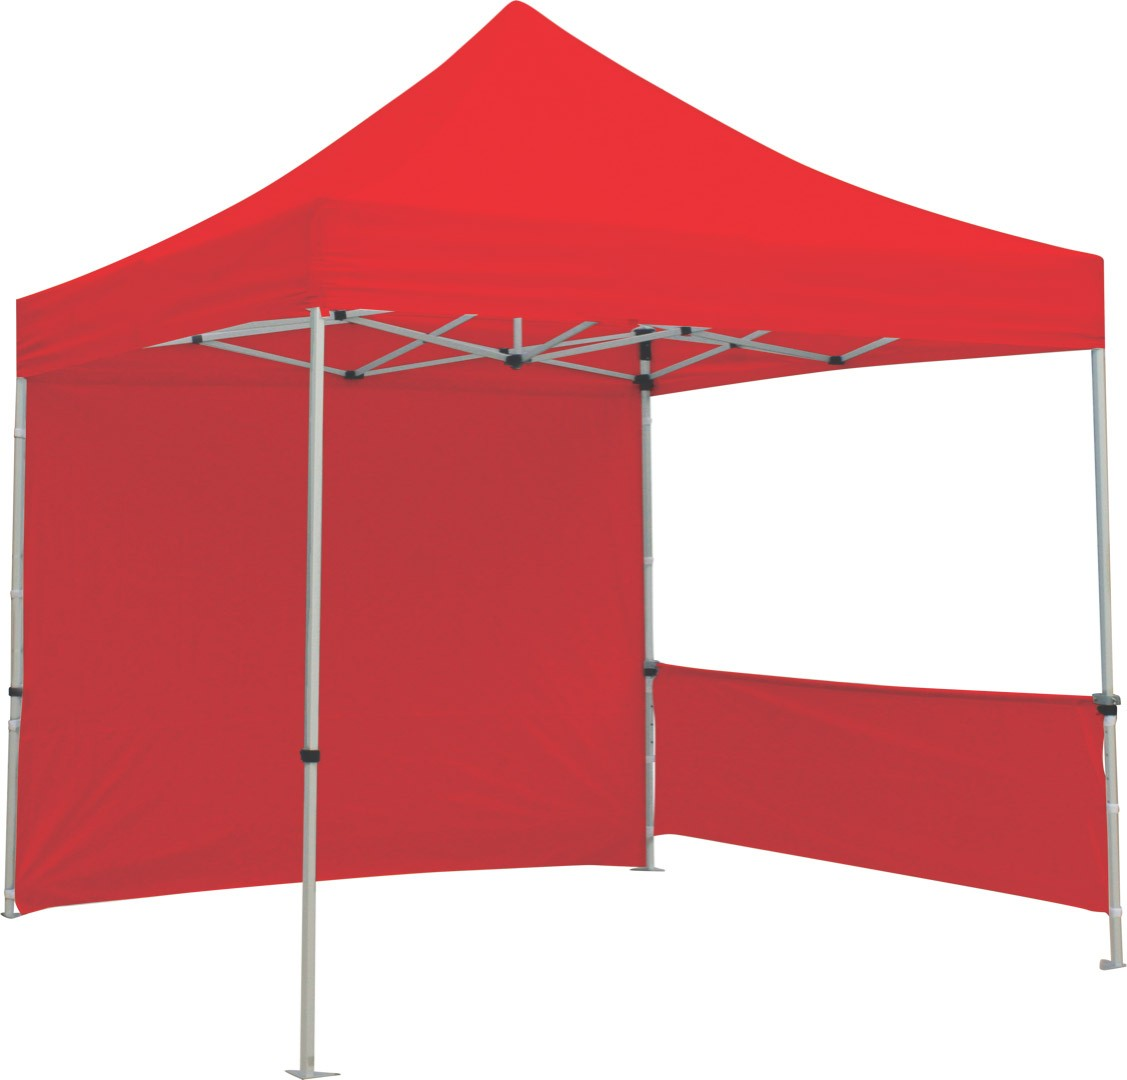 Canopy Tents | Outdoor Displays | Displays | Power-Graphics com